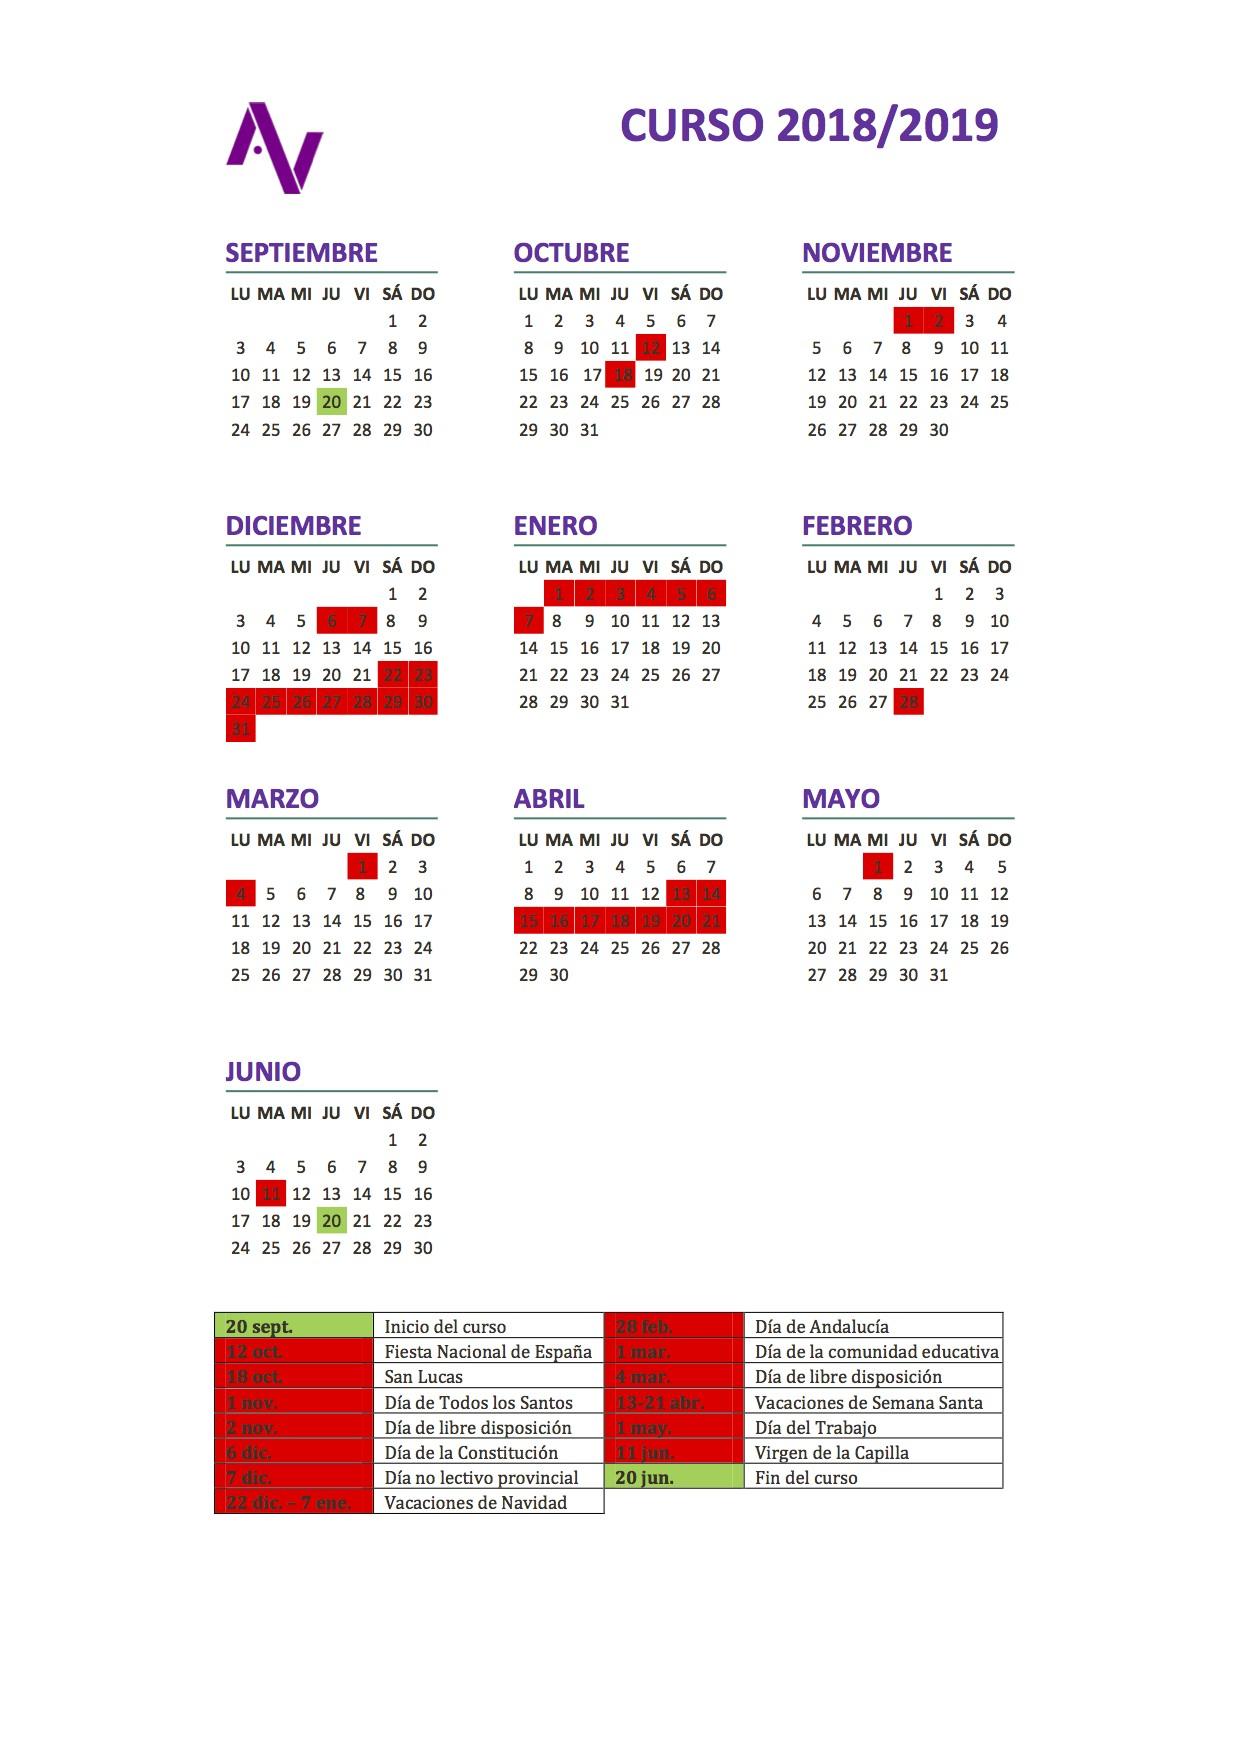 Calendario Escolar 2019 Jaen Recientes Calendario Escolar Of Calendario Escolar 2019 Jaen Más Recientemente Liberado Horarios Del Curso 2018 2019 – I E S Fuente De La Pe±a